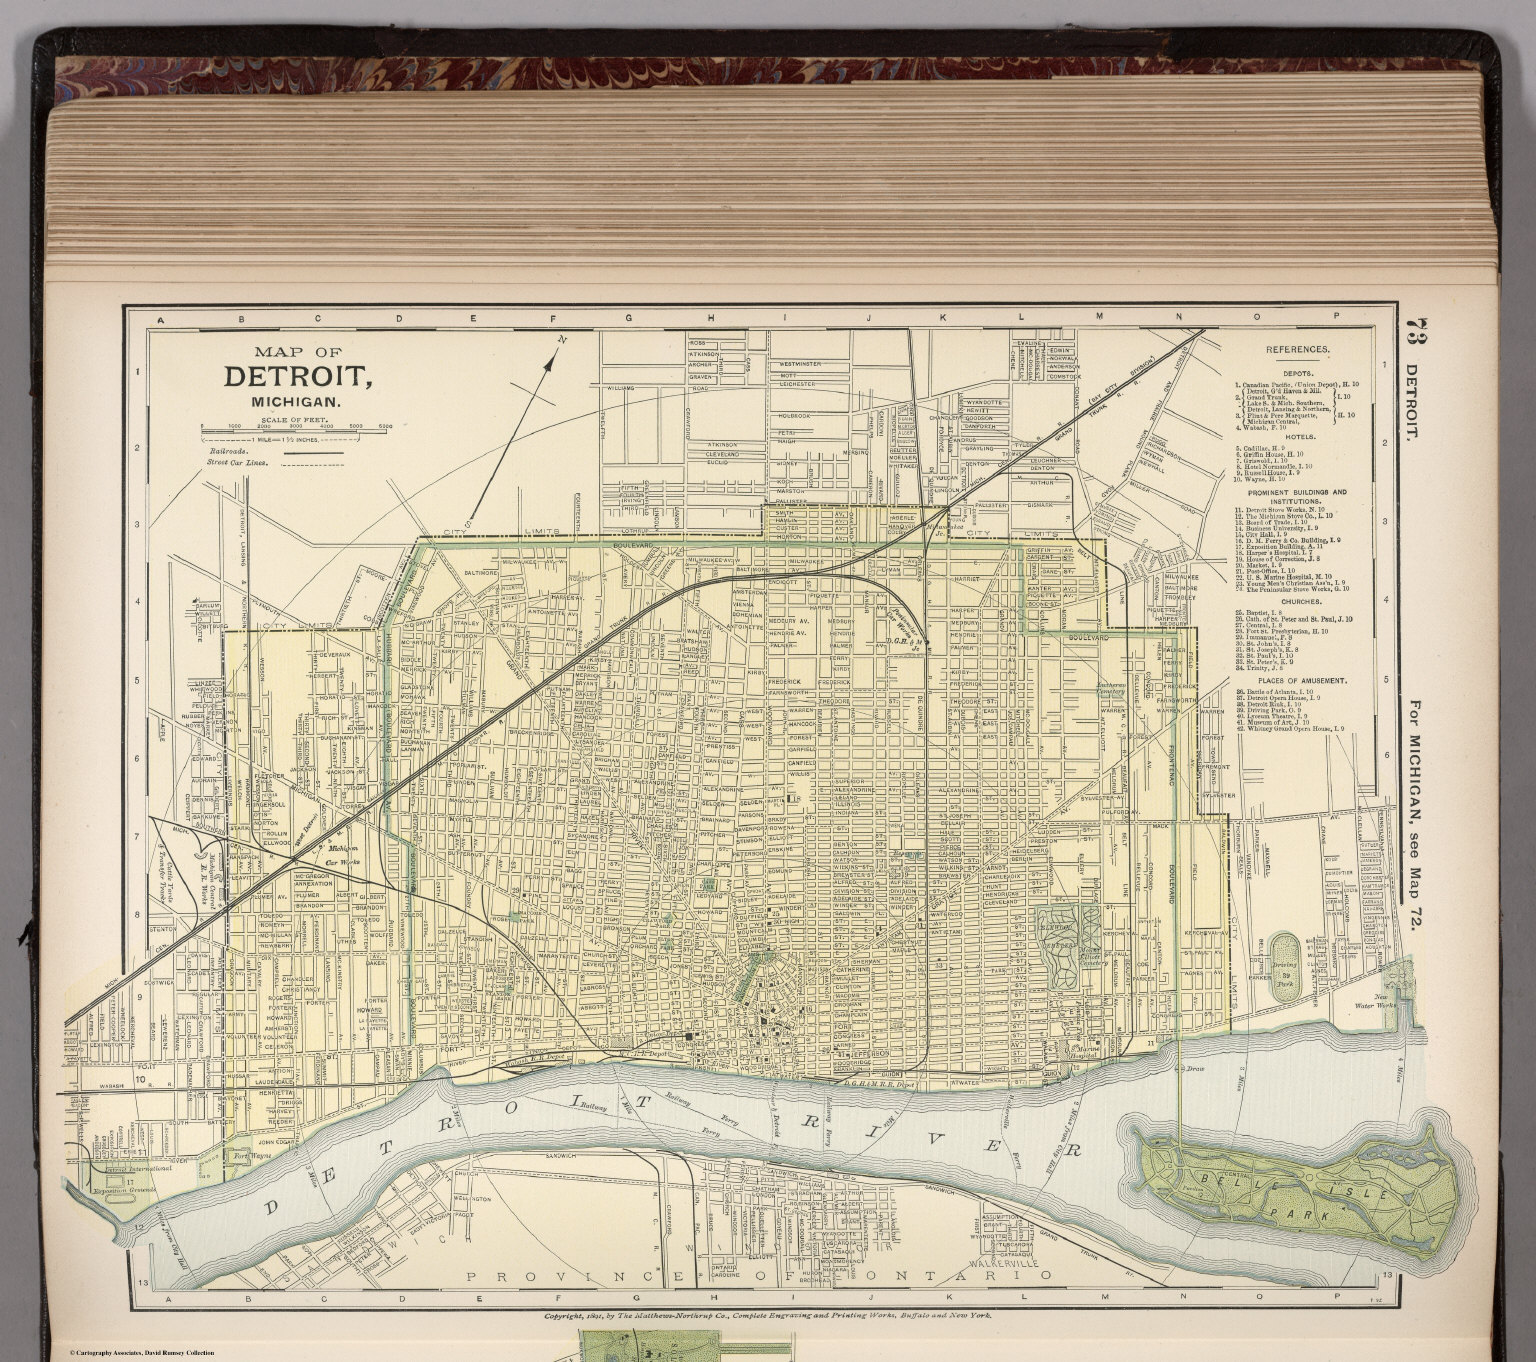 Map of Detroit, Michigan. 73